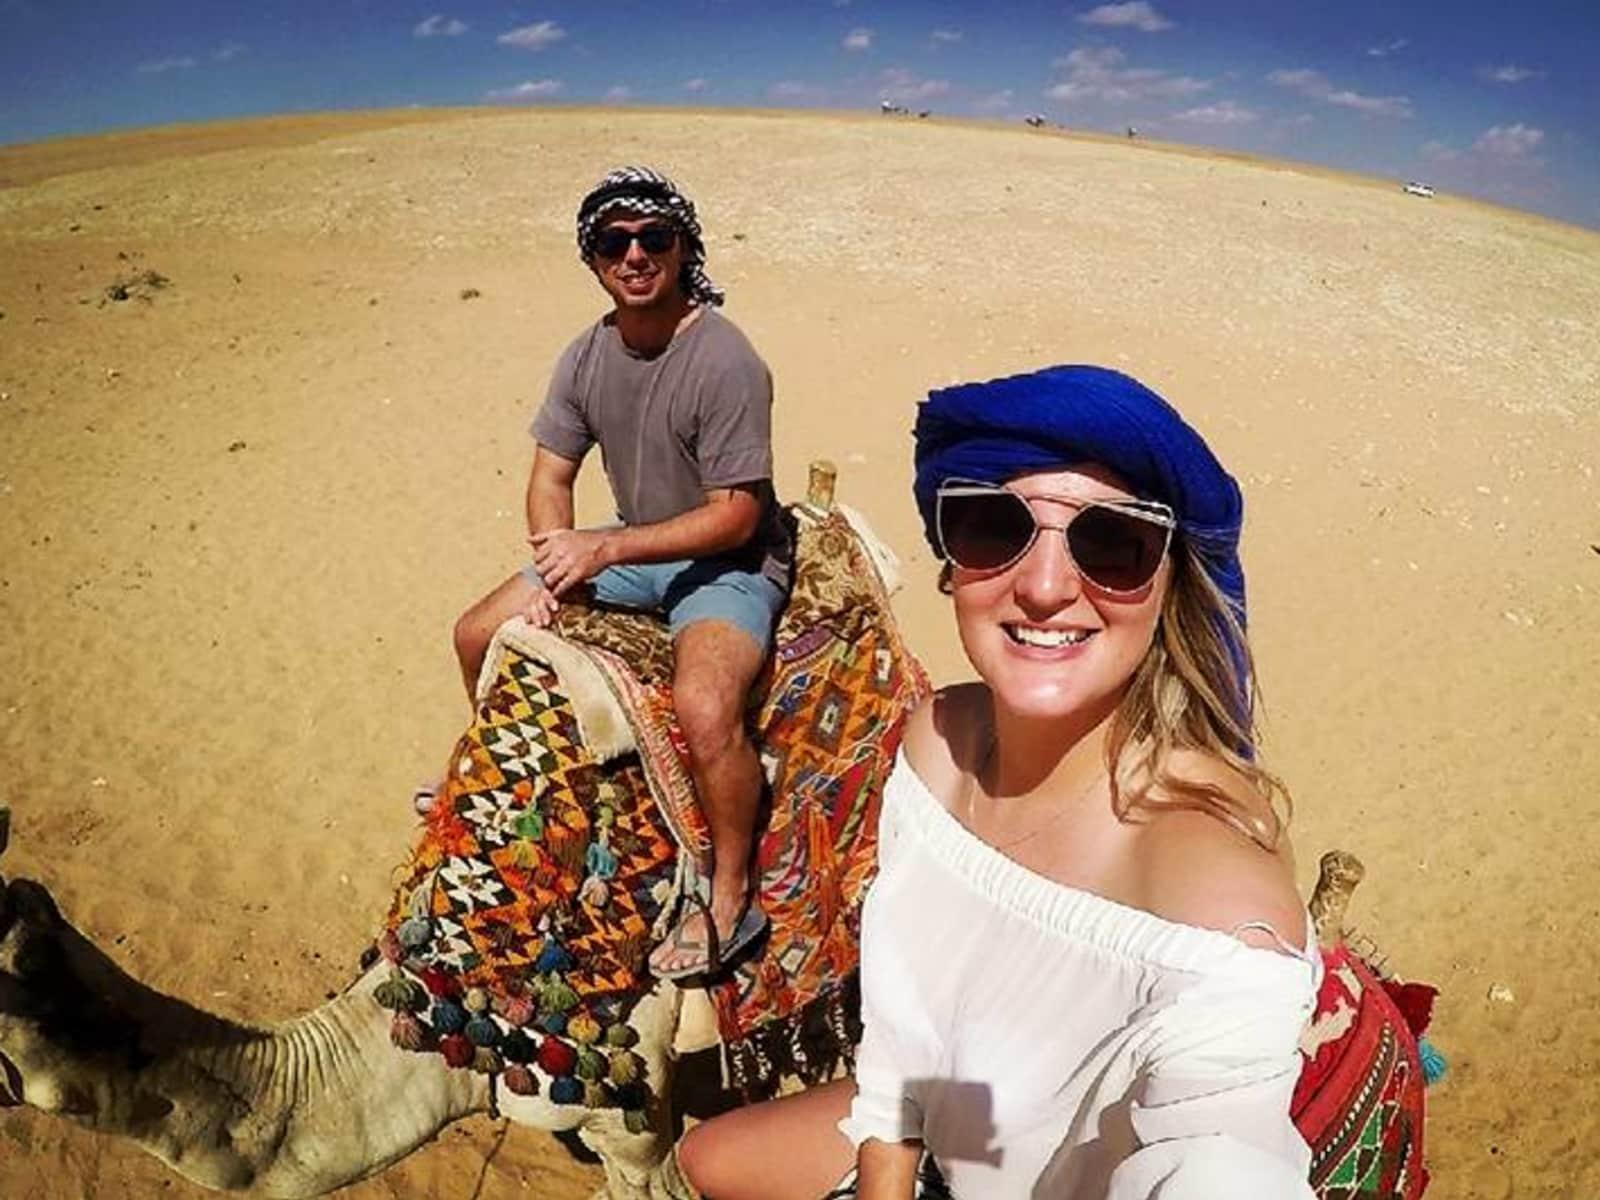 Amanda from Gold Coast, Queensland, Australia